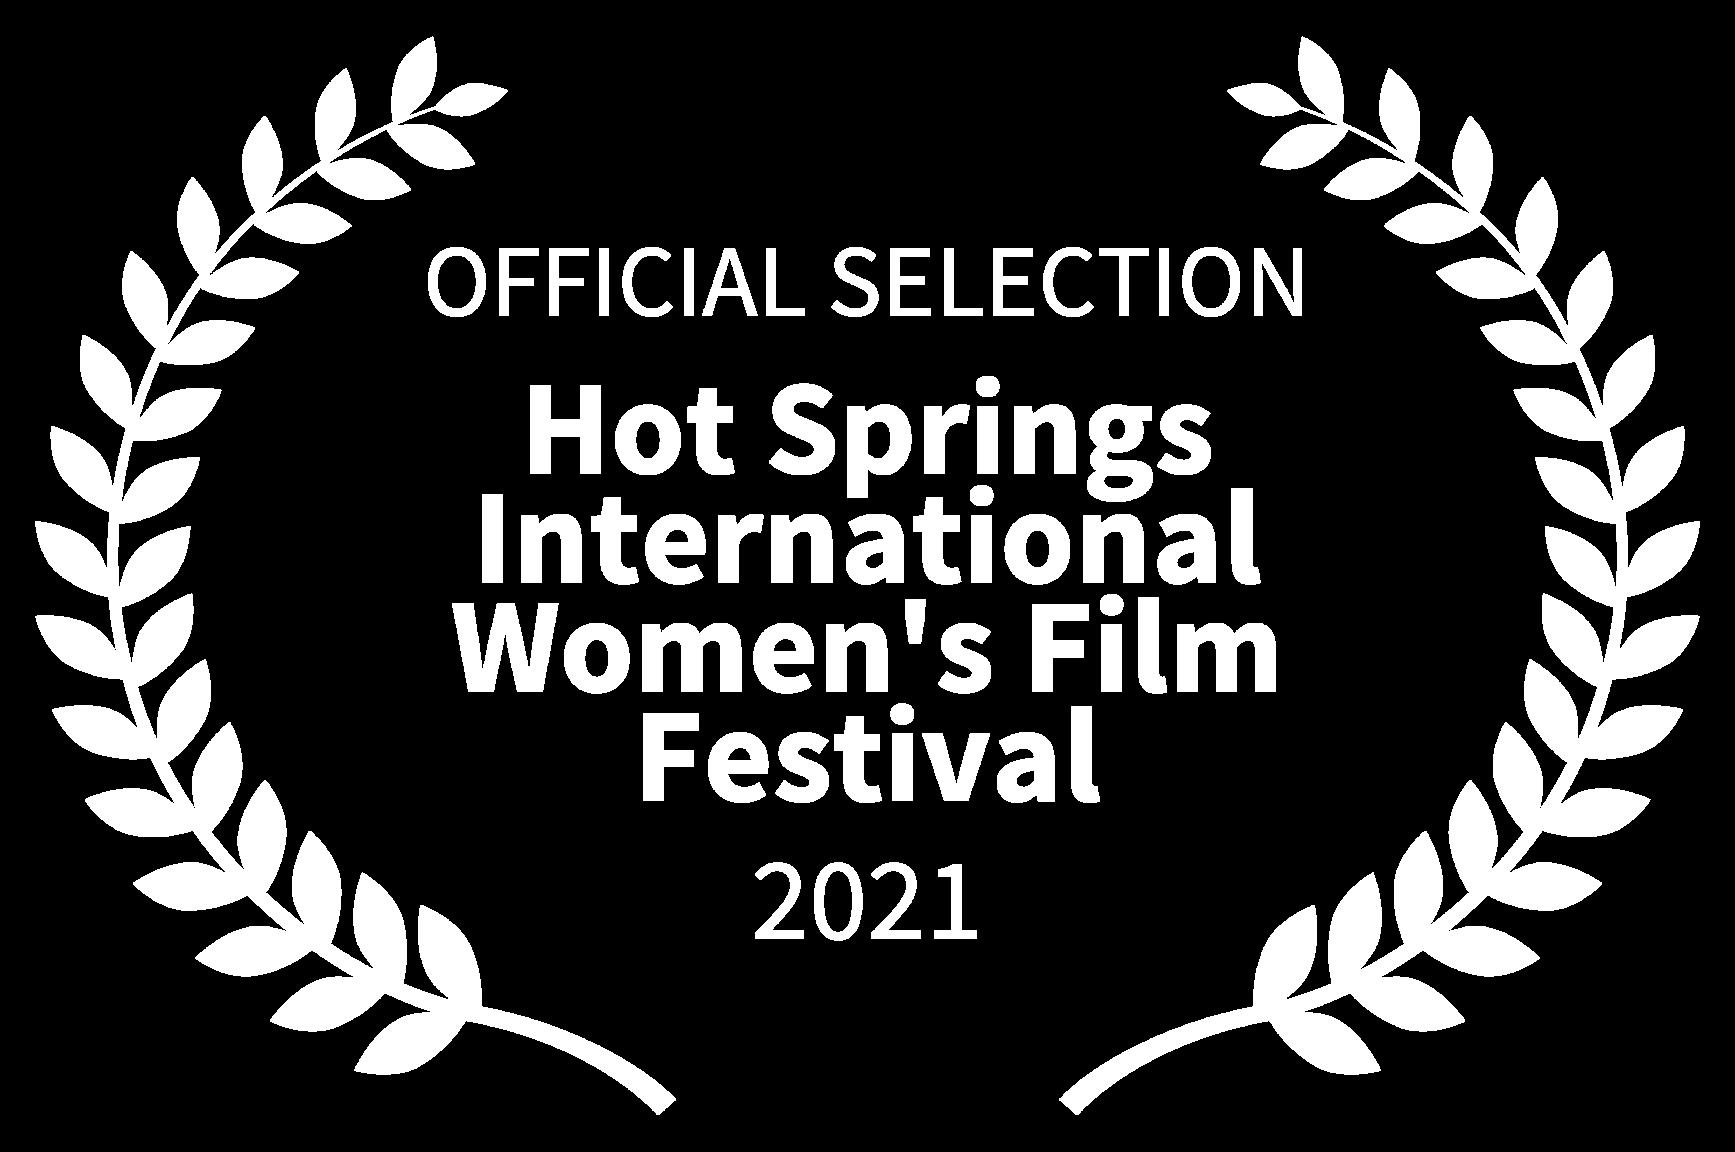 Hot Springs International Woman's Film Festival